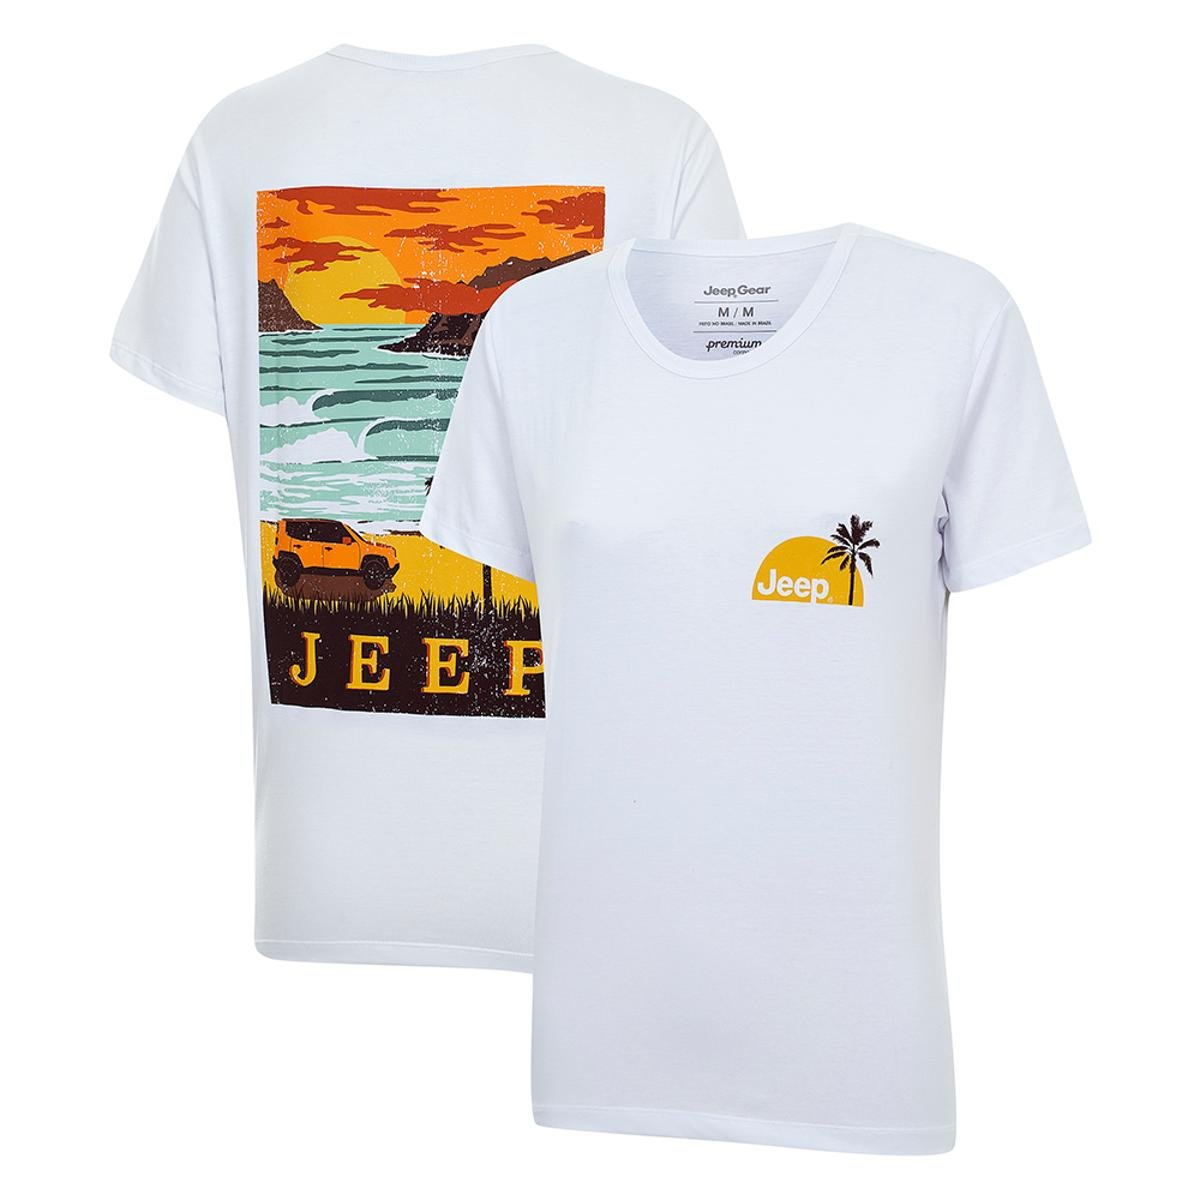 598e6c9a28 Camiseta JEEP Renegade Surf Feminina - Branco - Compre Agora